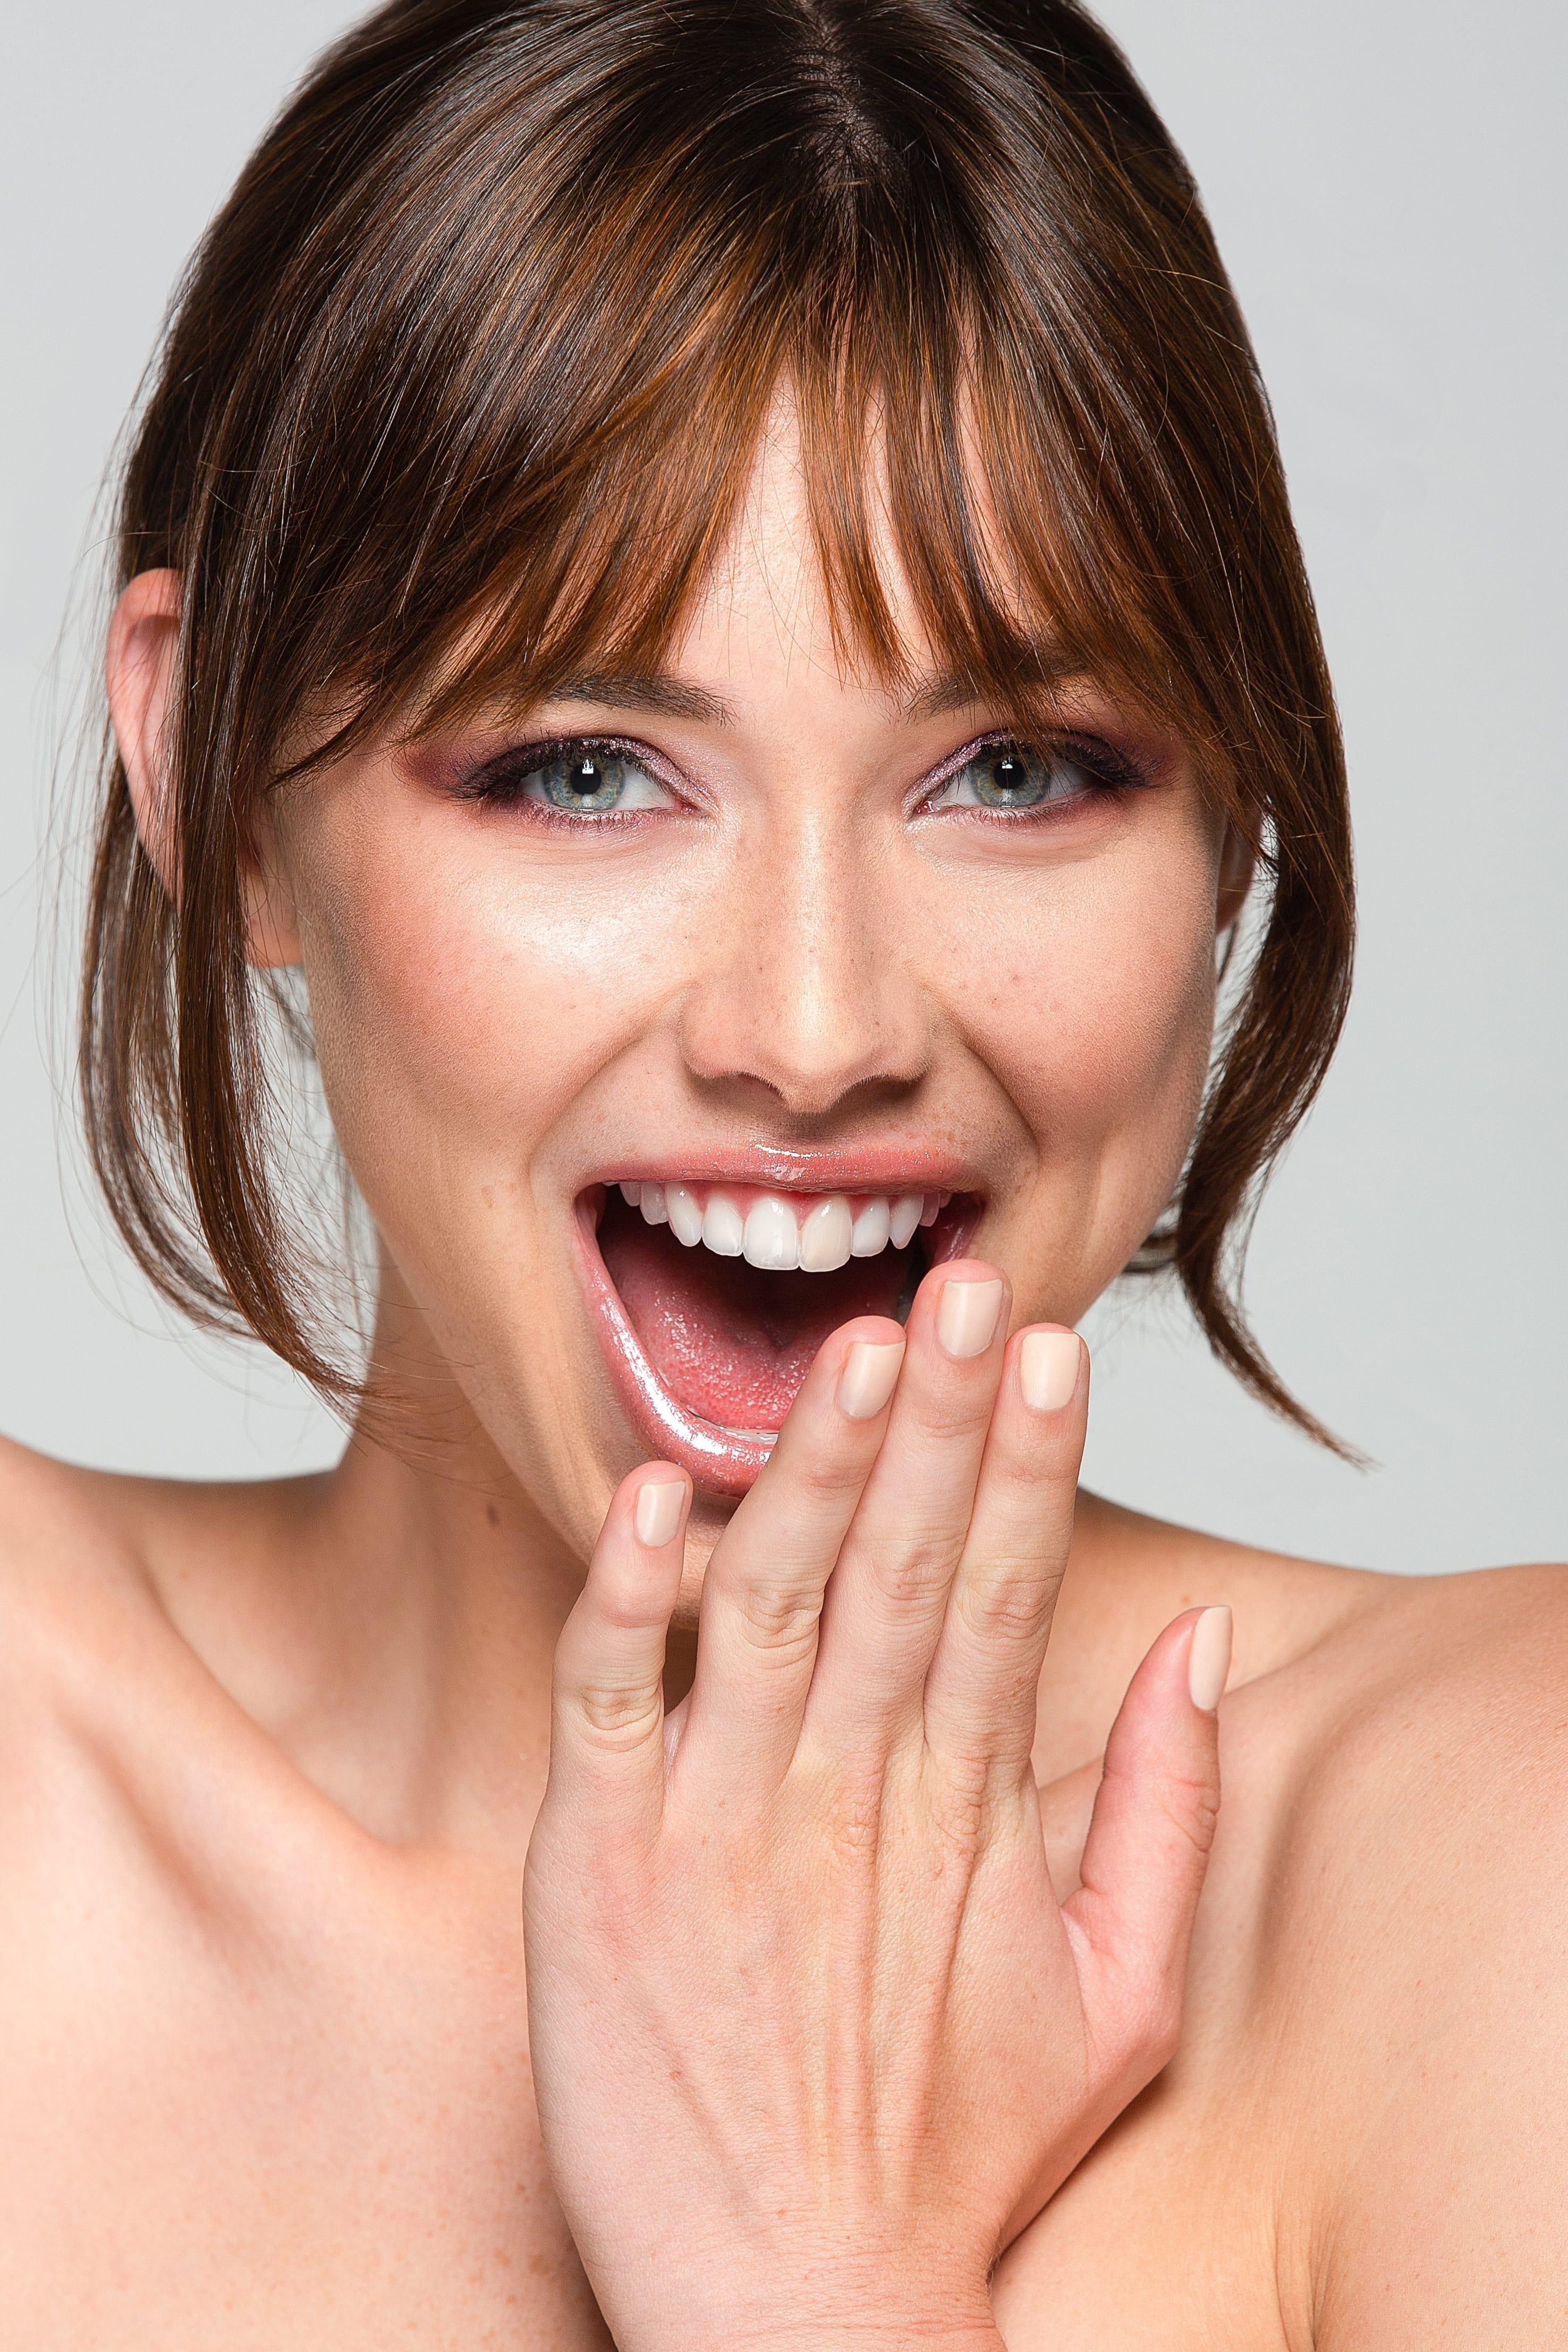 Creative ways to celebrate International Women's Day 2020 in your salon